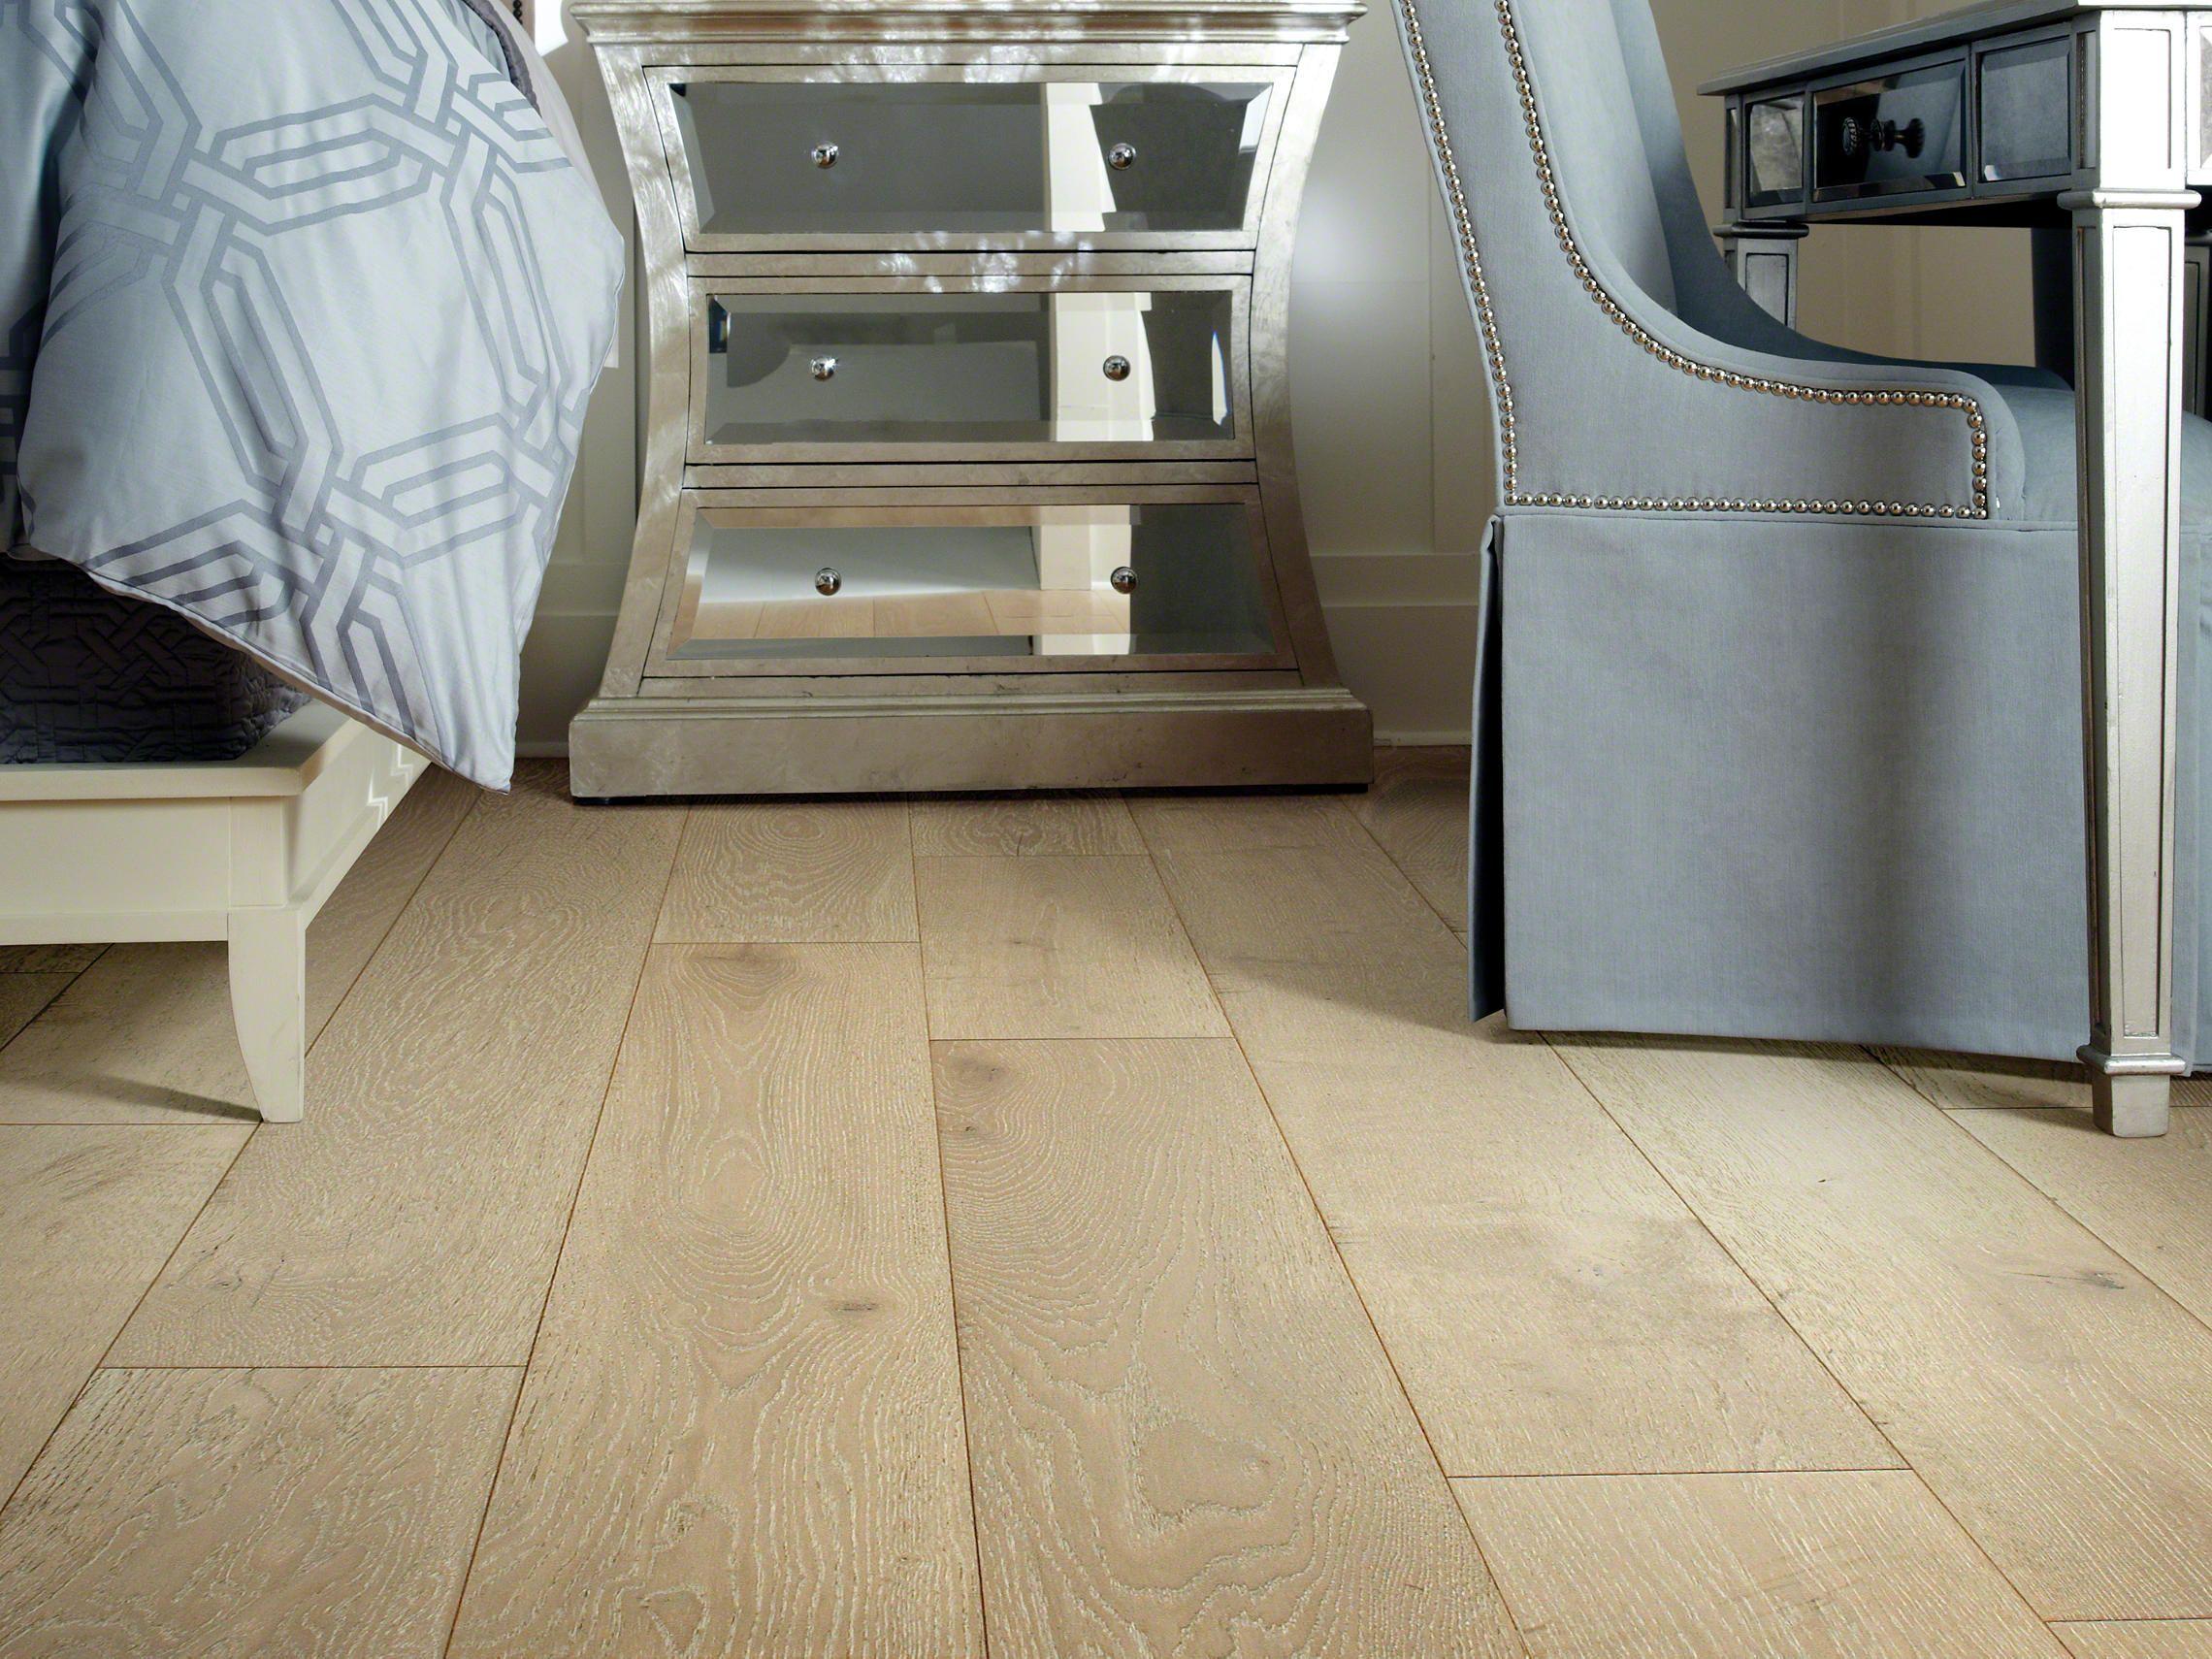 Shaw floors argonne forest oak tower 00146 7 5 x random lengths x 0 5625